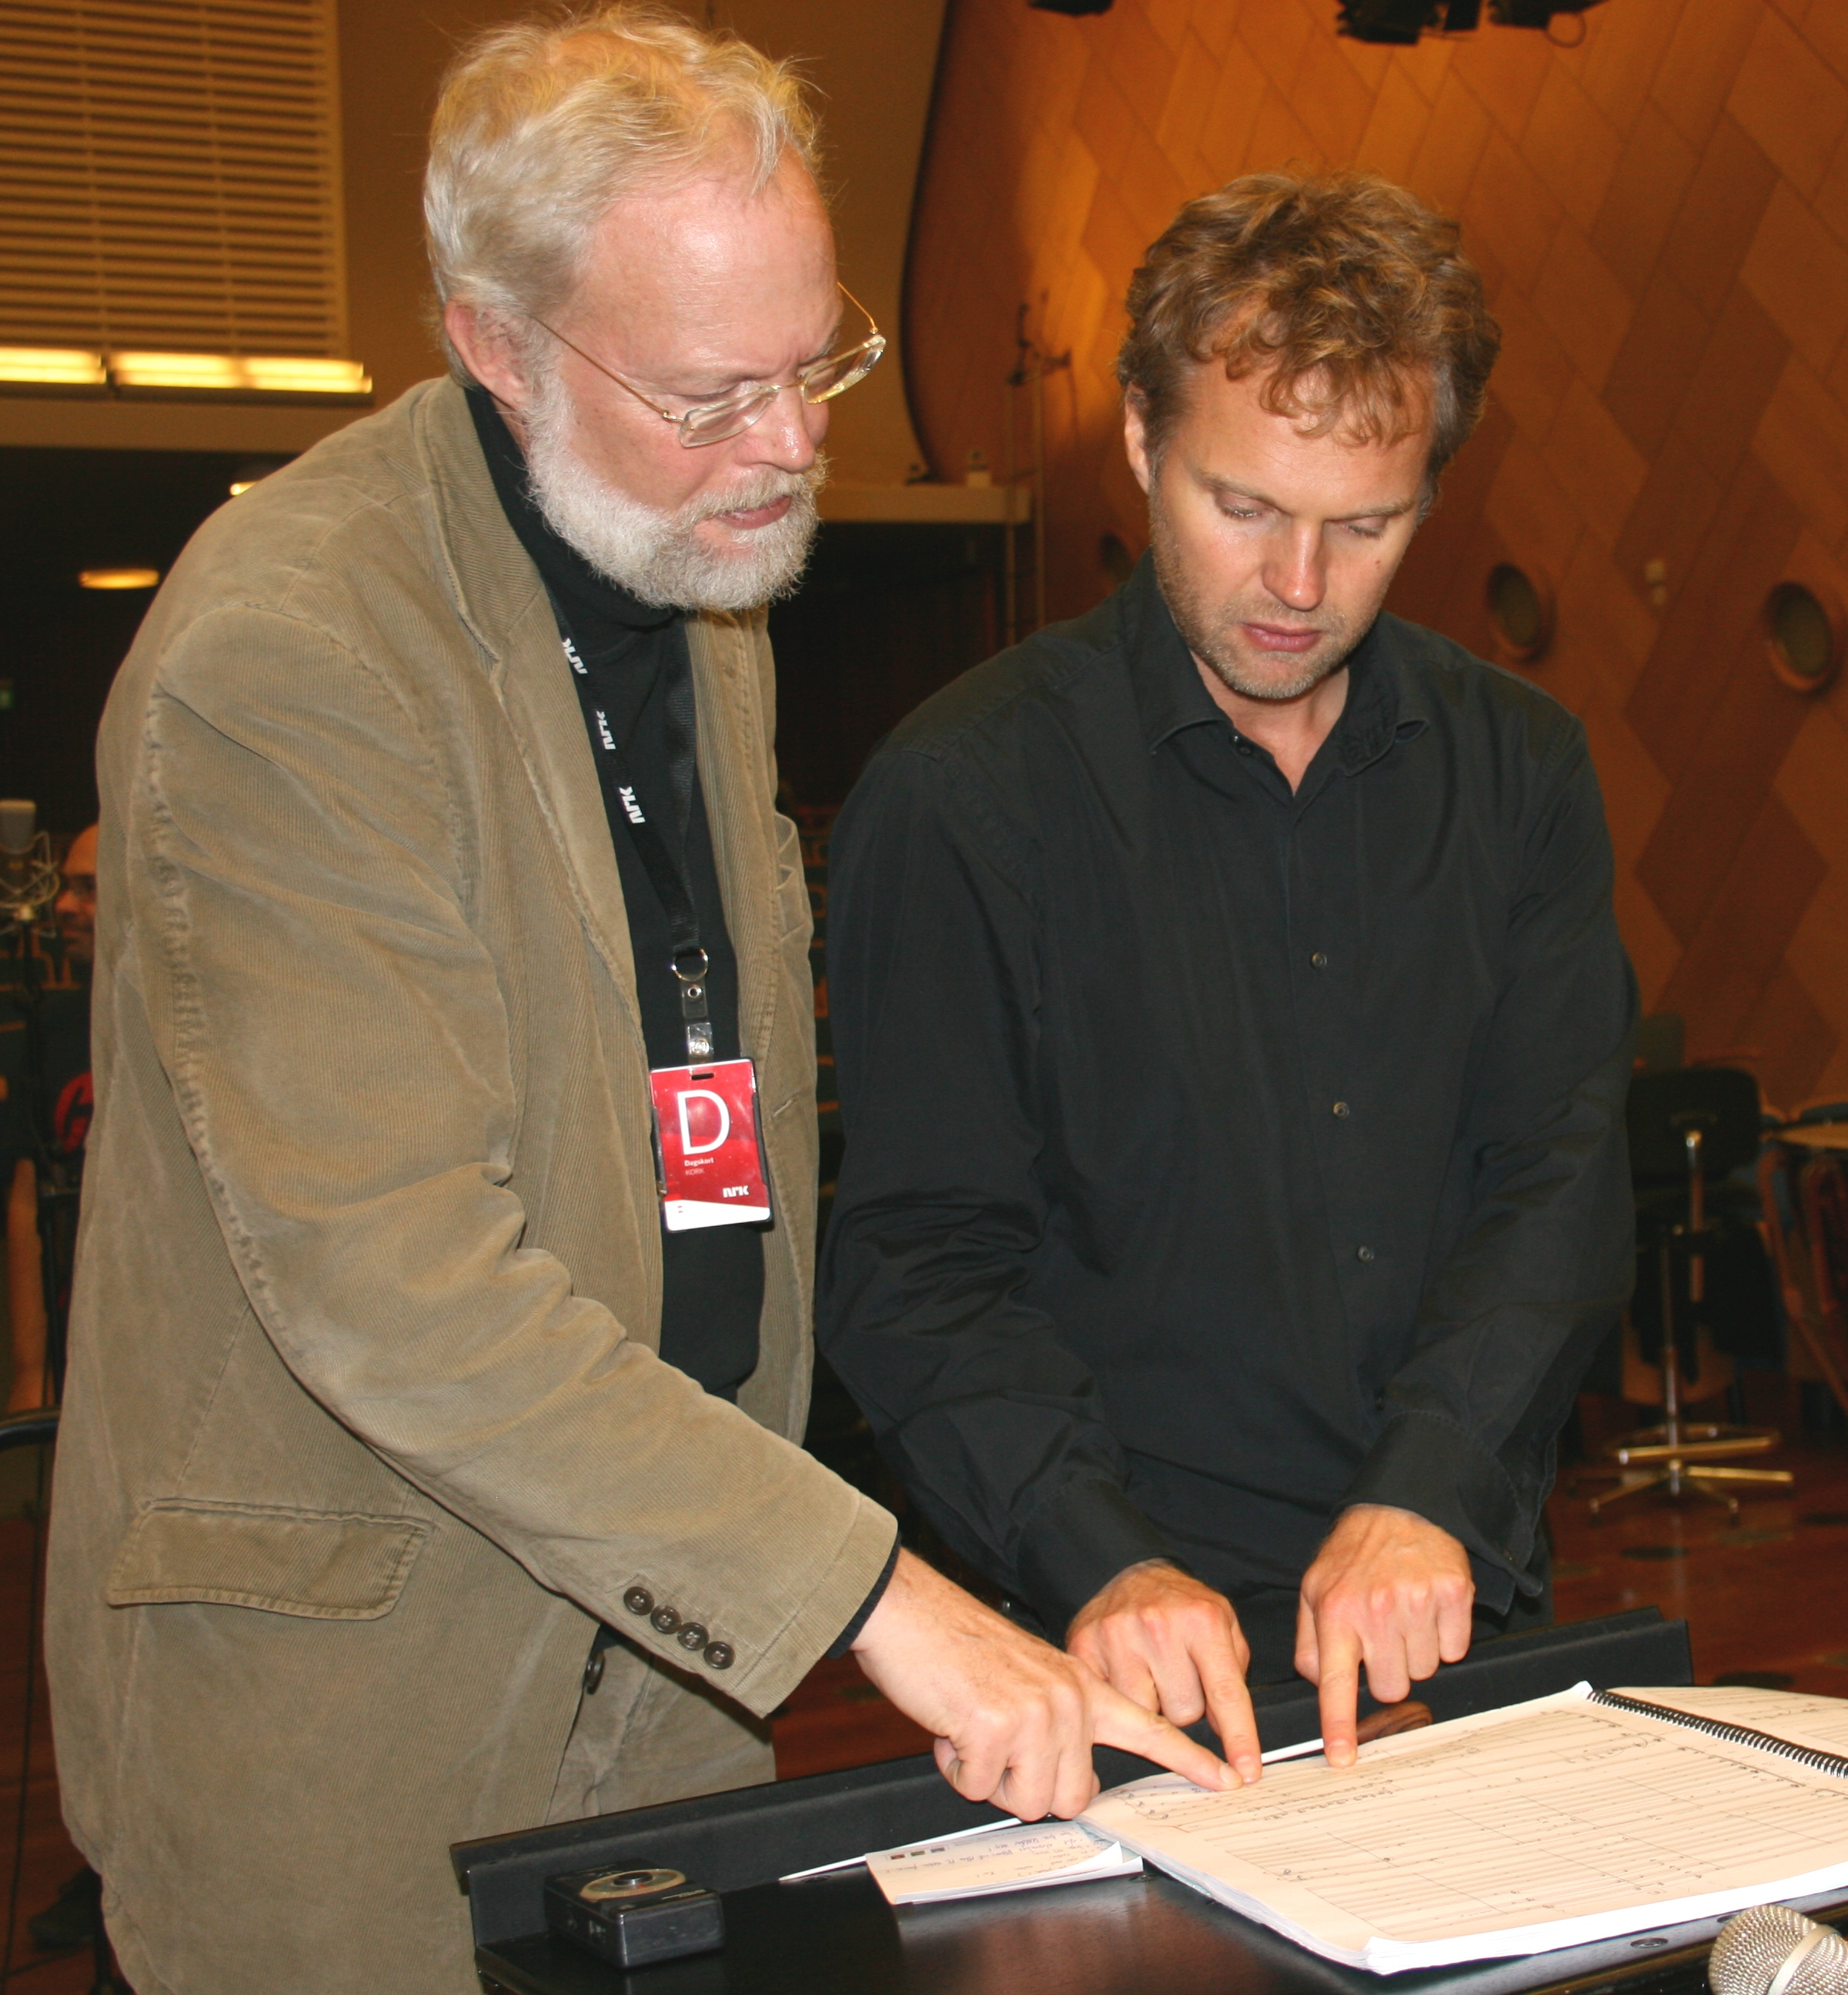 Ruders and Søndergård discussing.jpg